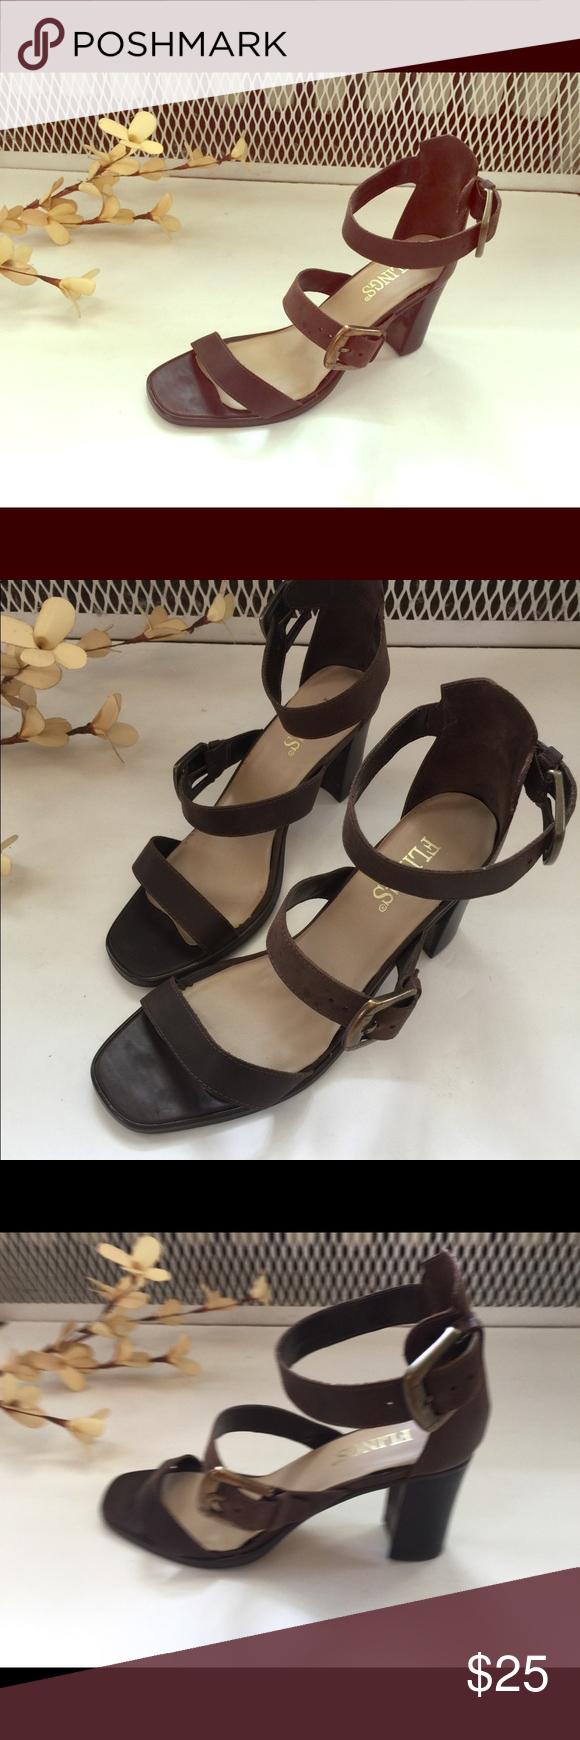 "Flings Leather Sandals Never worn leather sandals. Size 7. 3"" Heel. NWOB Flings Shoes Sandals"